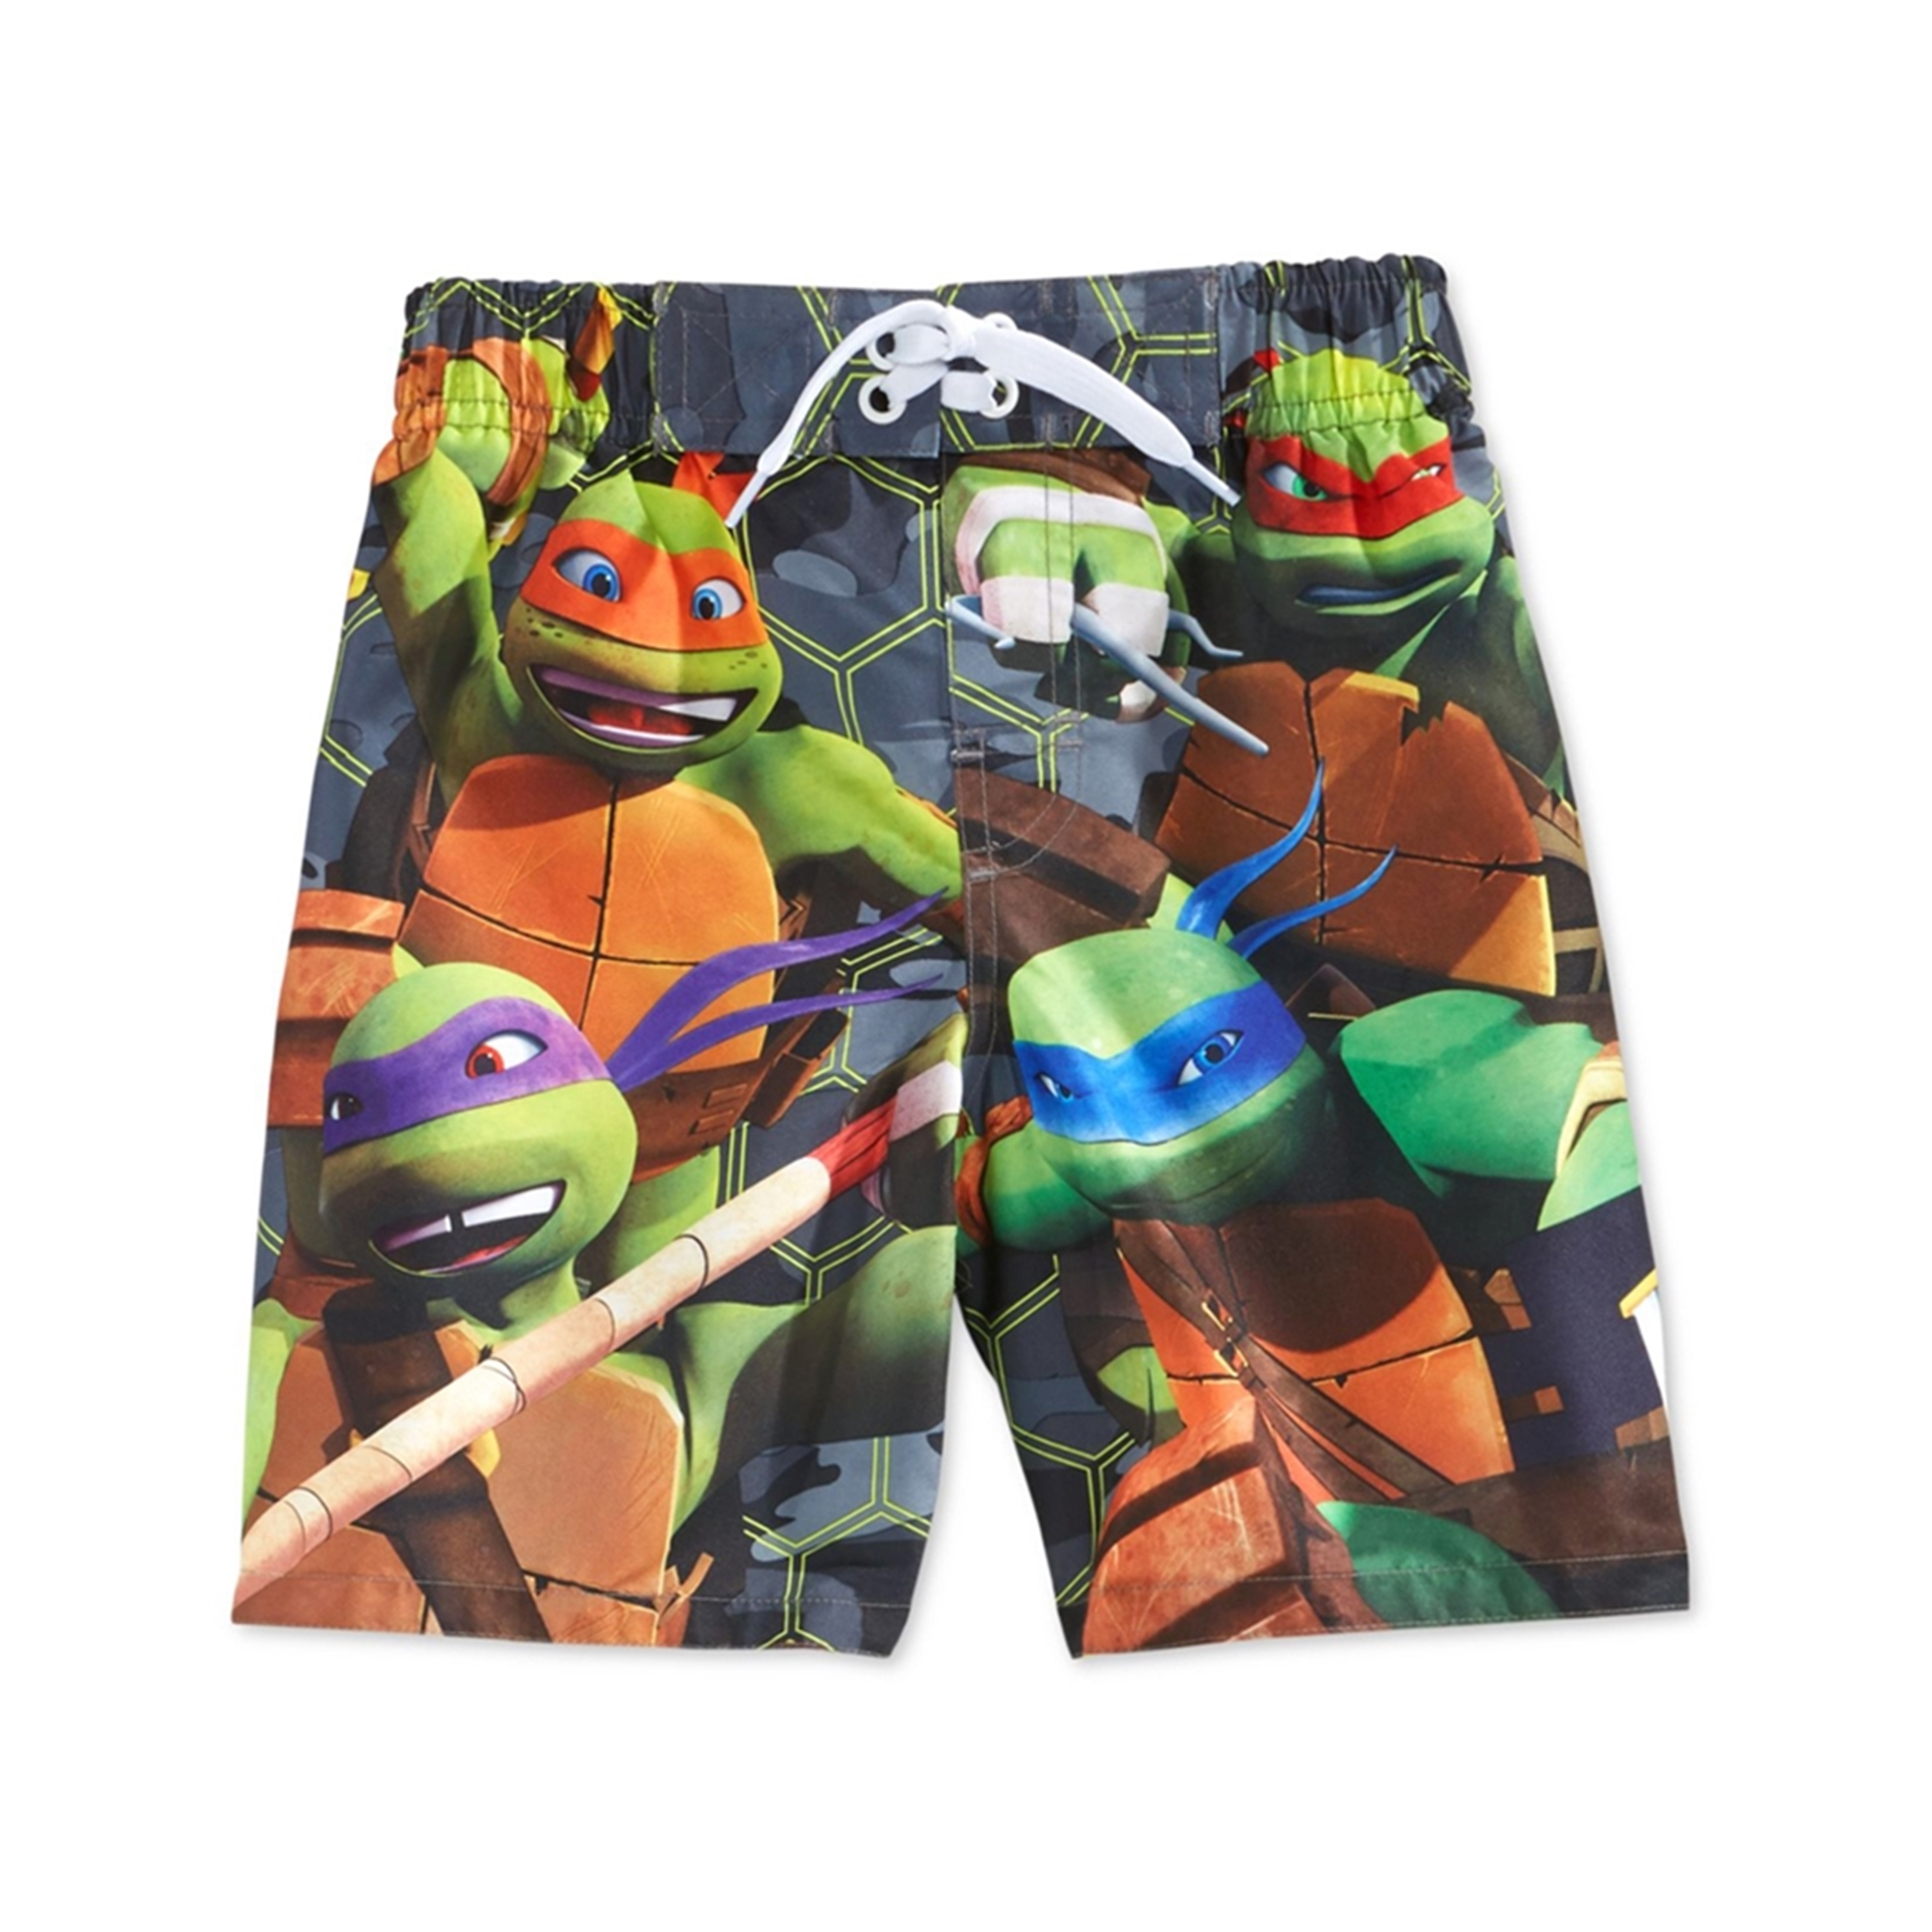 Teenage Mutant Ninja Turtles Nickelodeon Boy Swim Trunks Shorts Size 6